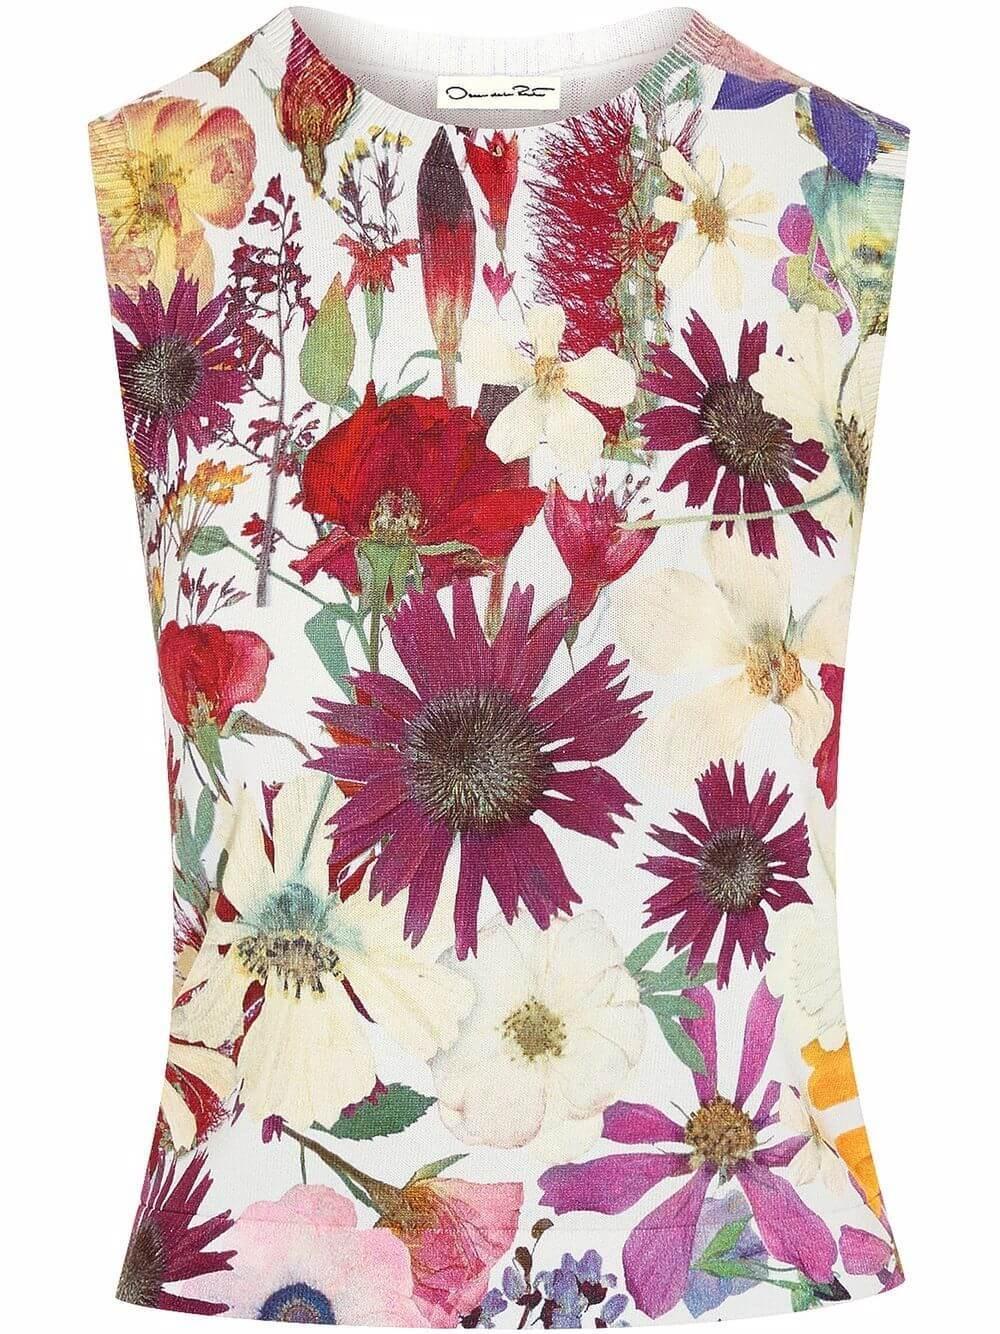 Pressed Flower Knit Tank Item # 21FN124RBP